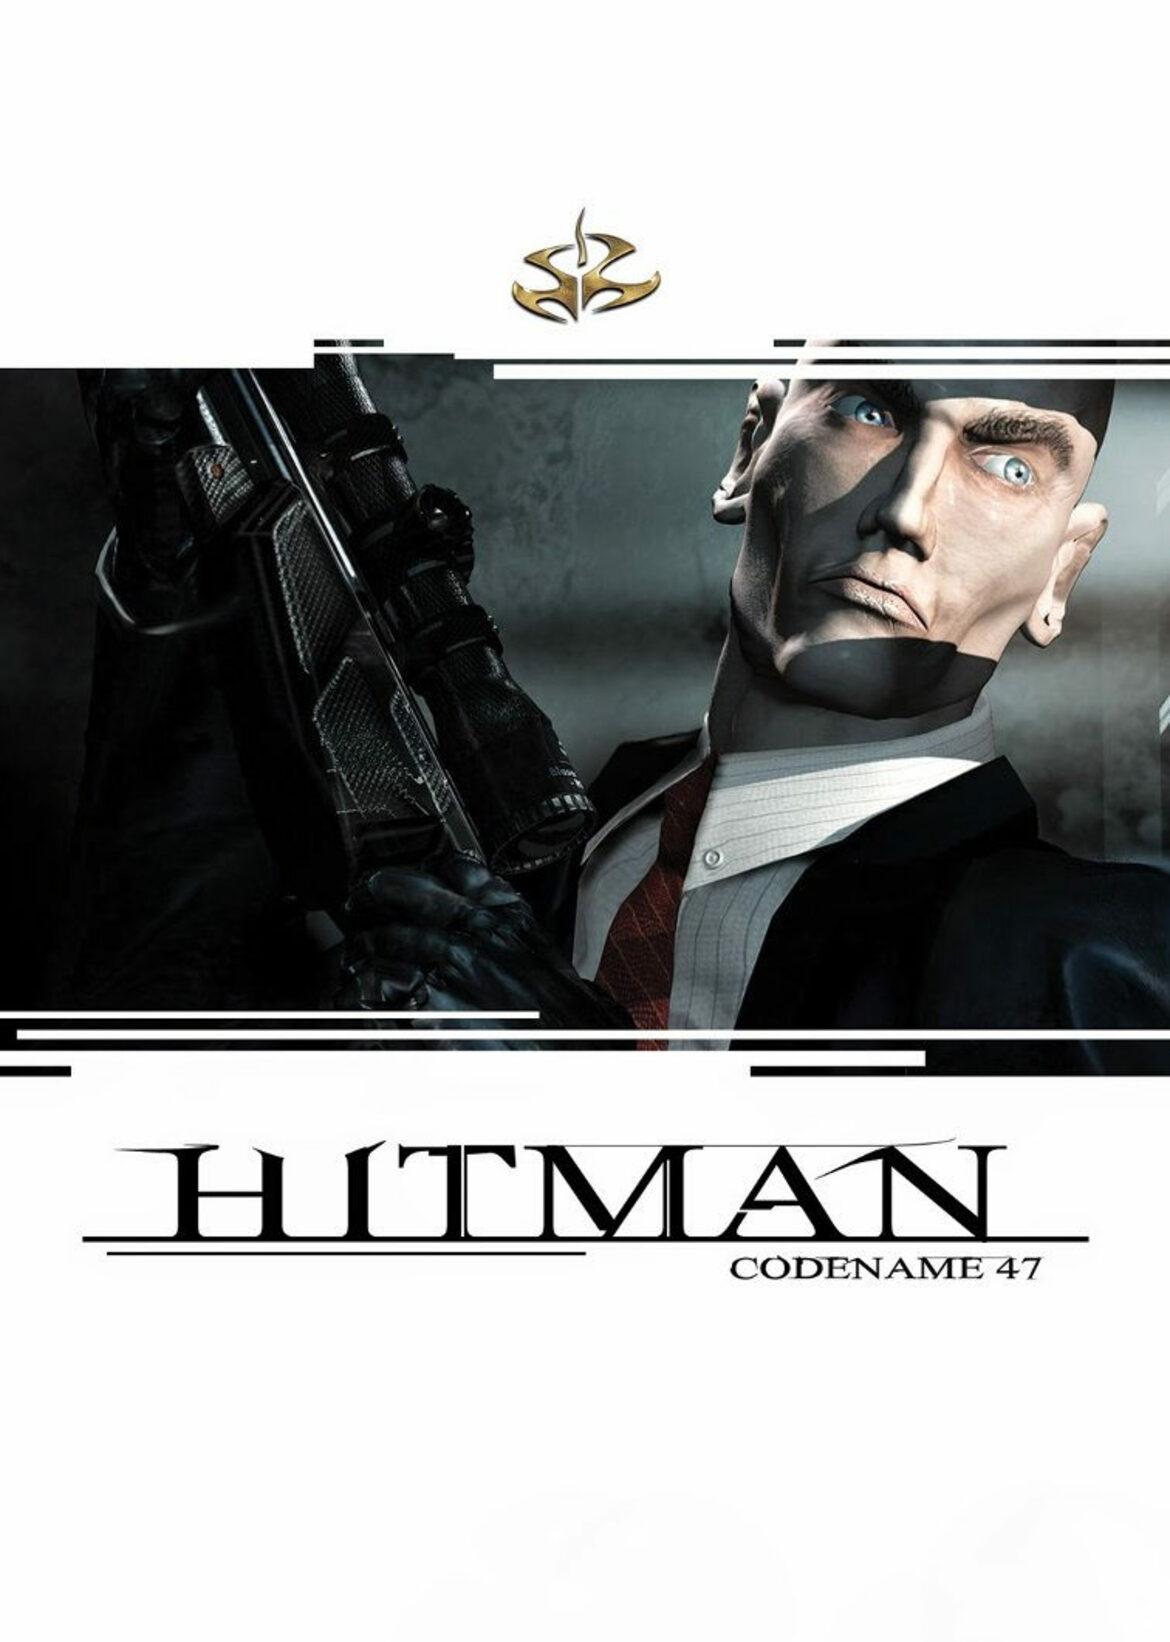 download hitman codename 47 pc pt-br